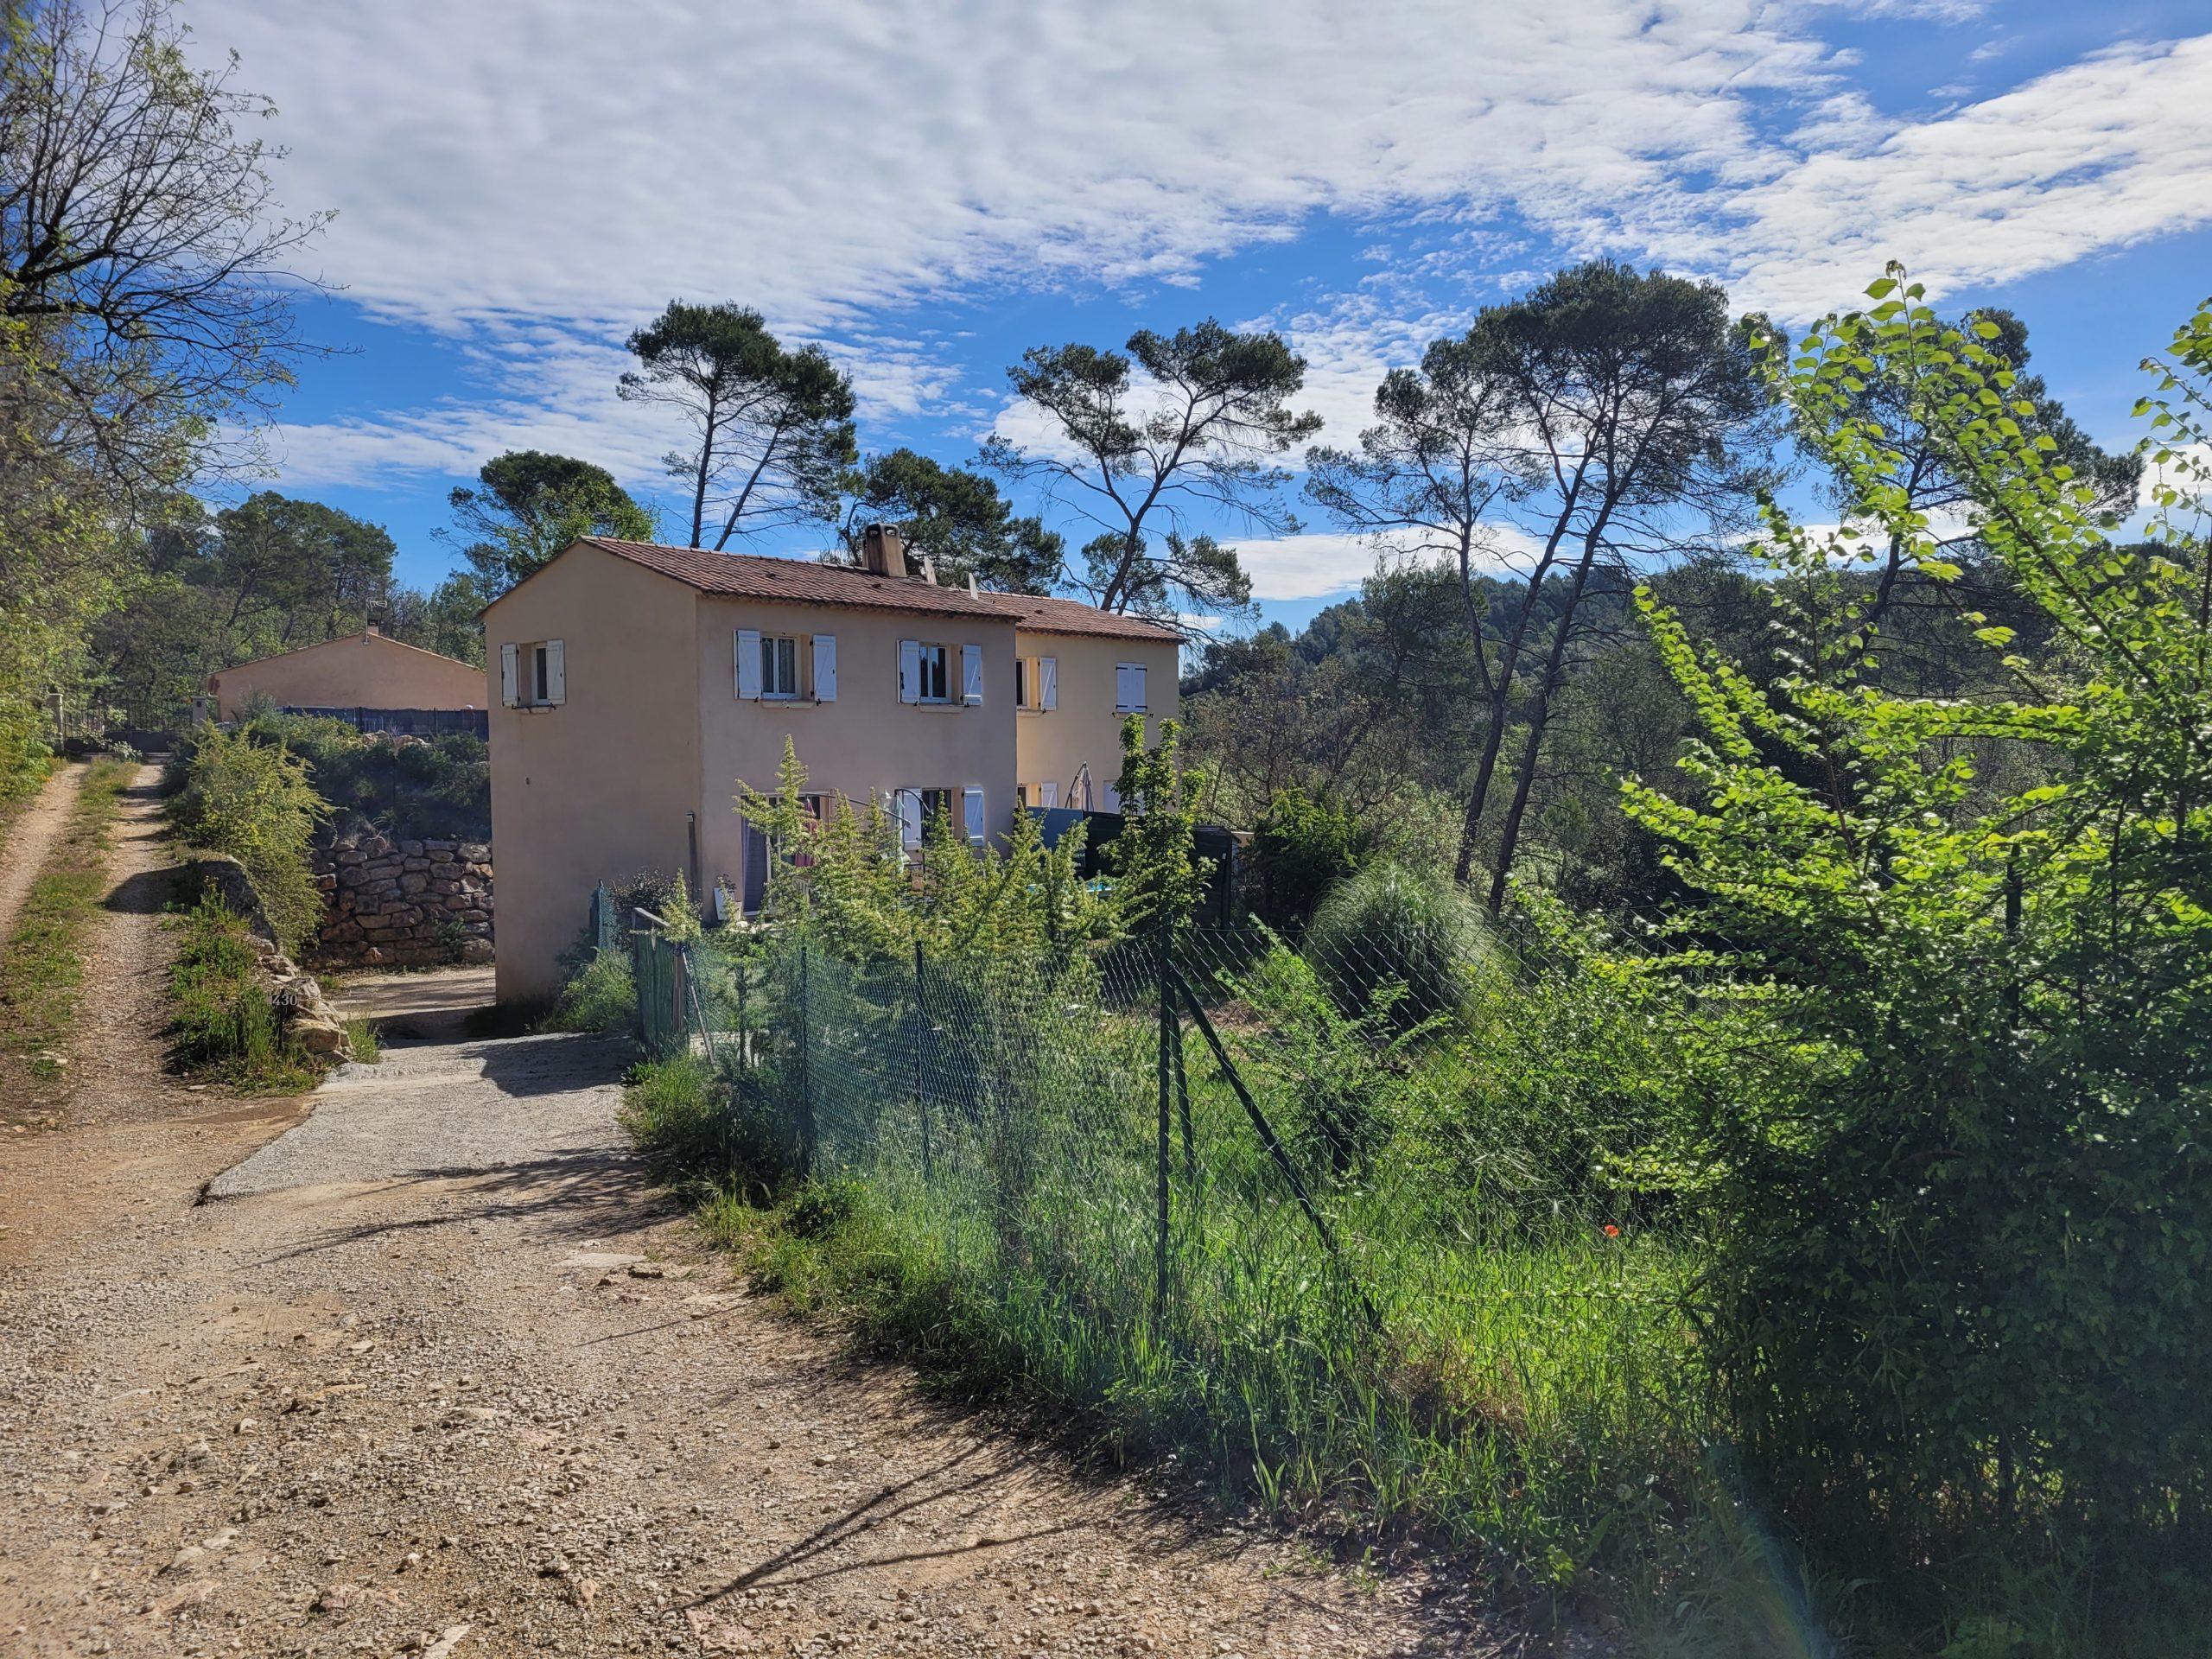 Villa mitoyenne 90m² 1000 m² de terrain – Le Thoronet